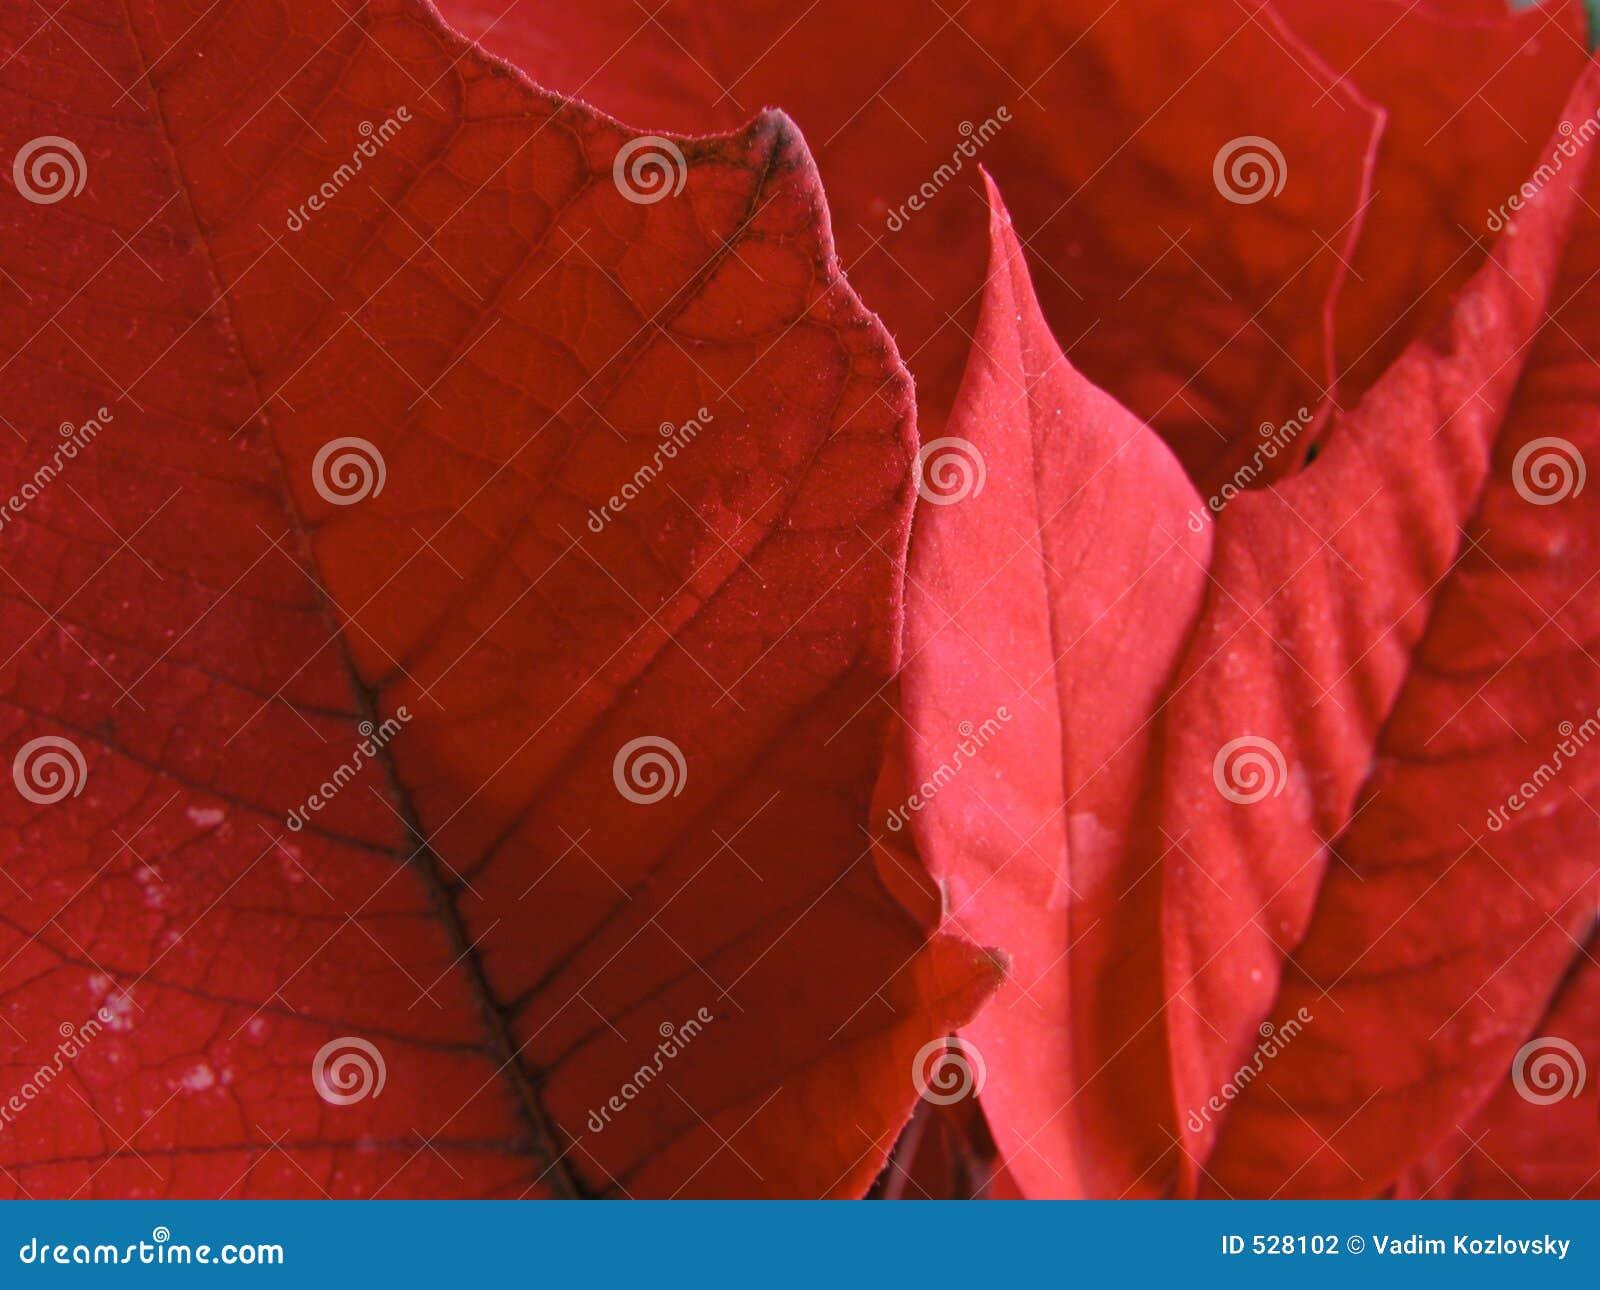 Download 红色的leafes 库存照片. 图片 包括有 叶子, 背包, 构成, 特写镜头, 有机, 纹理, 红色, 对比 - 528102